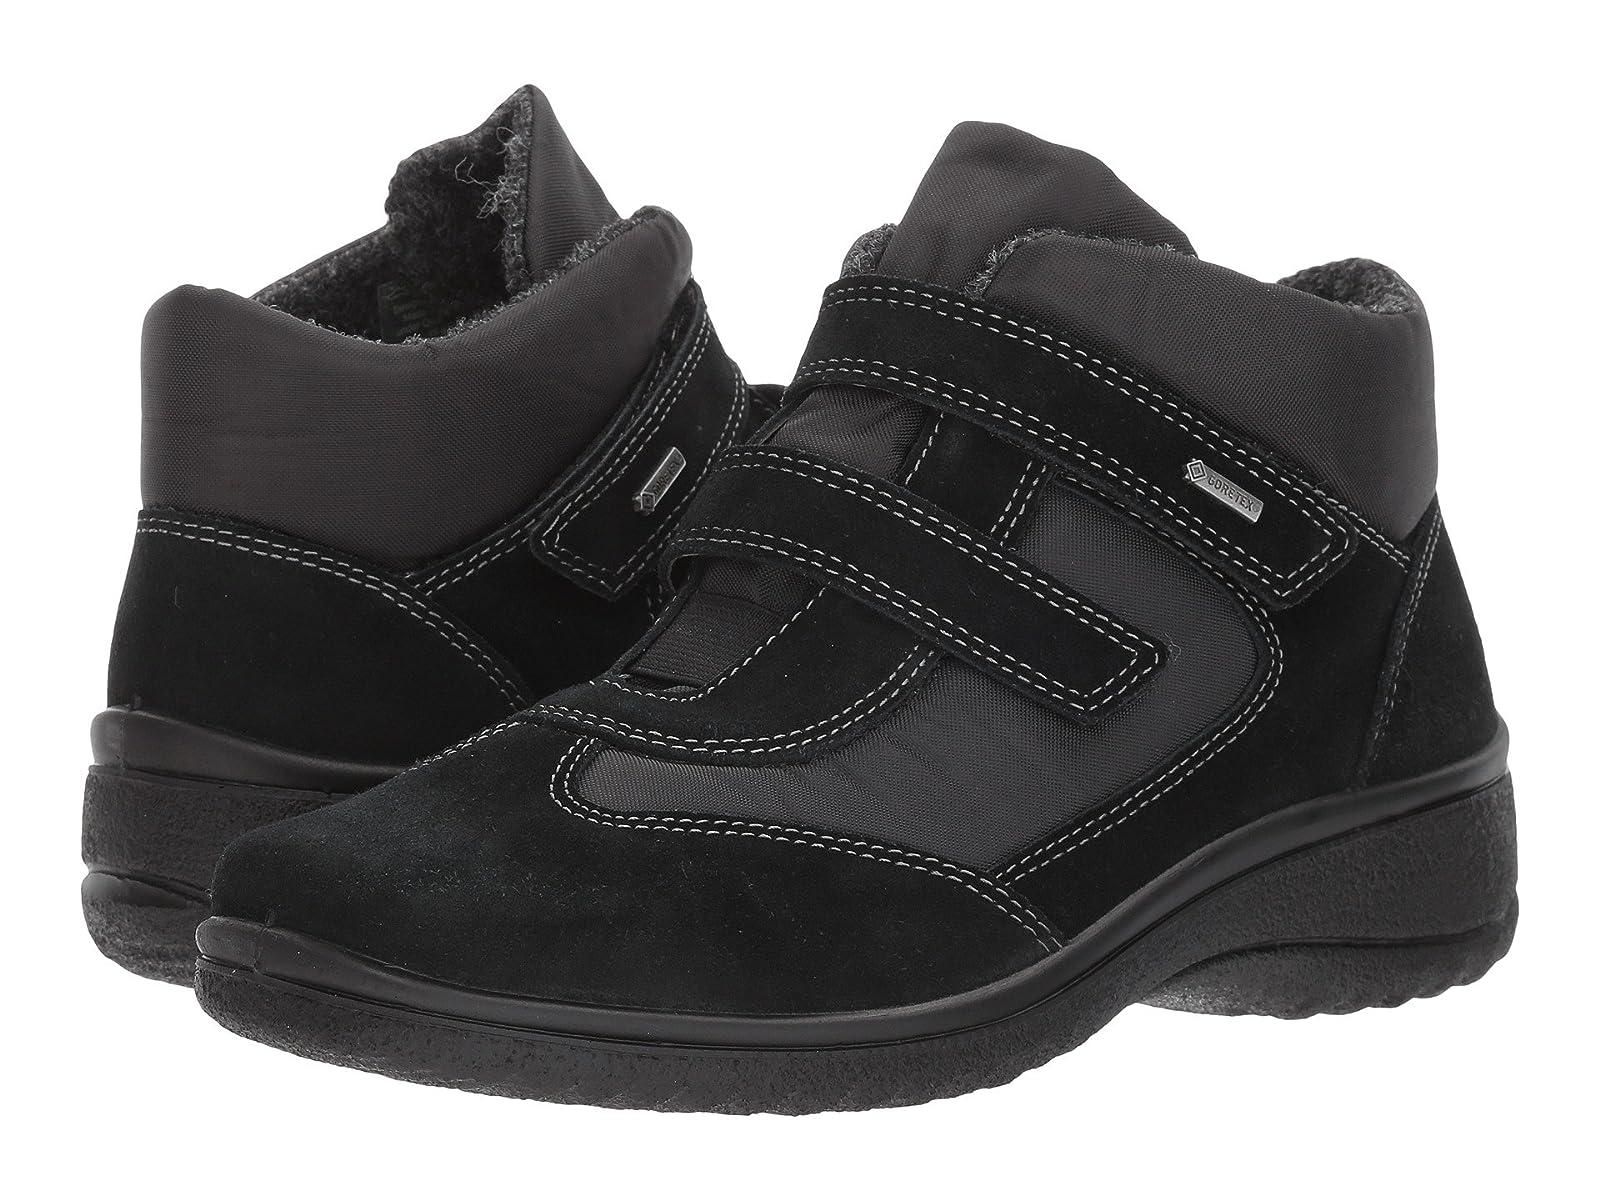 ara MaemiCheap and distinctive eye-catching shoes